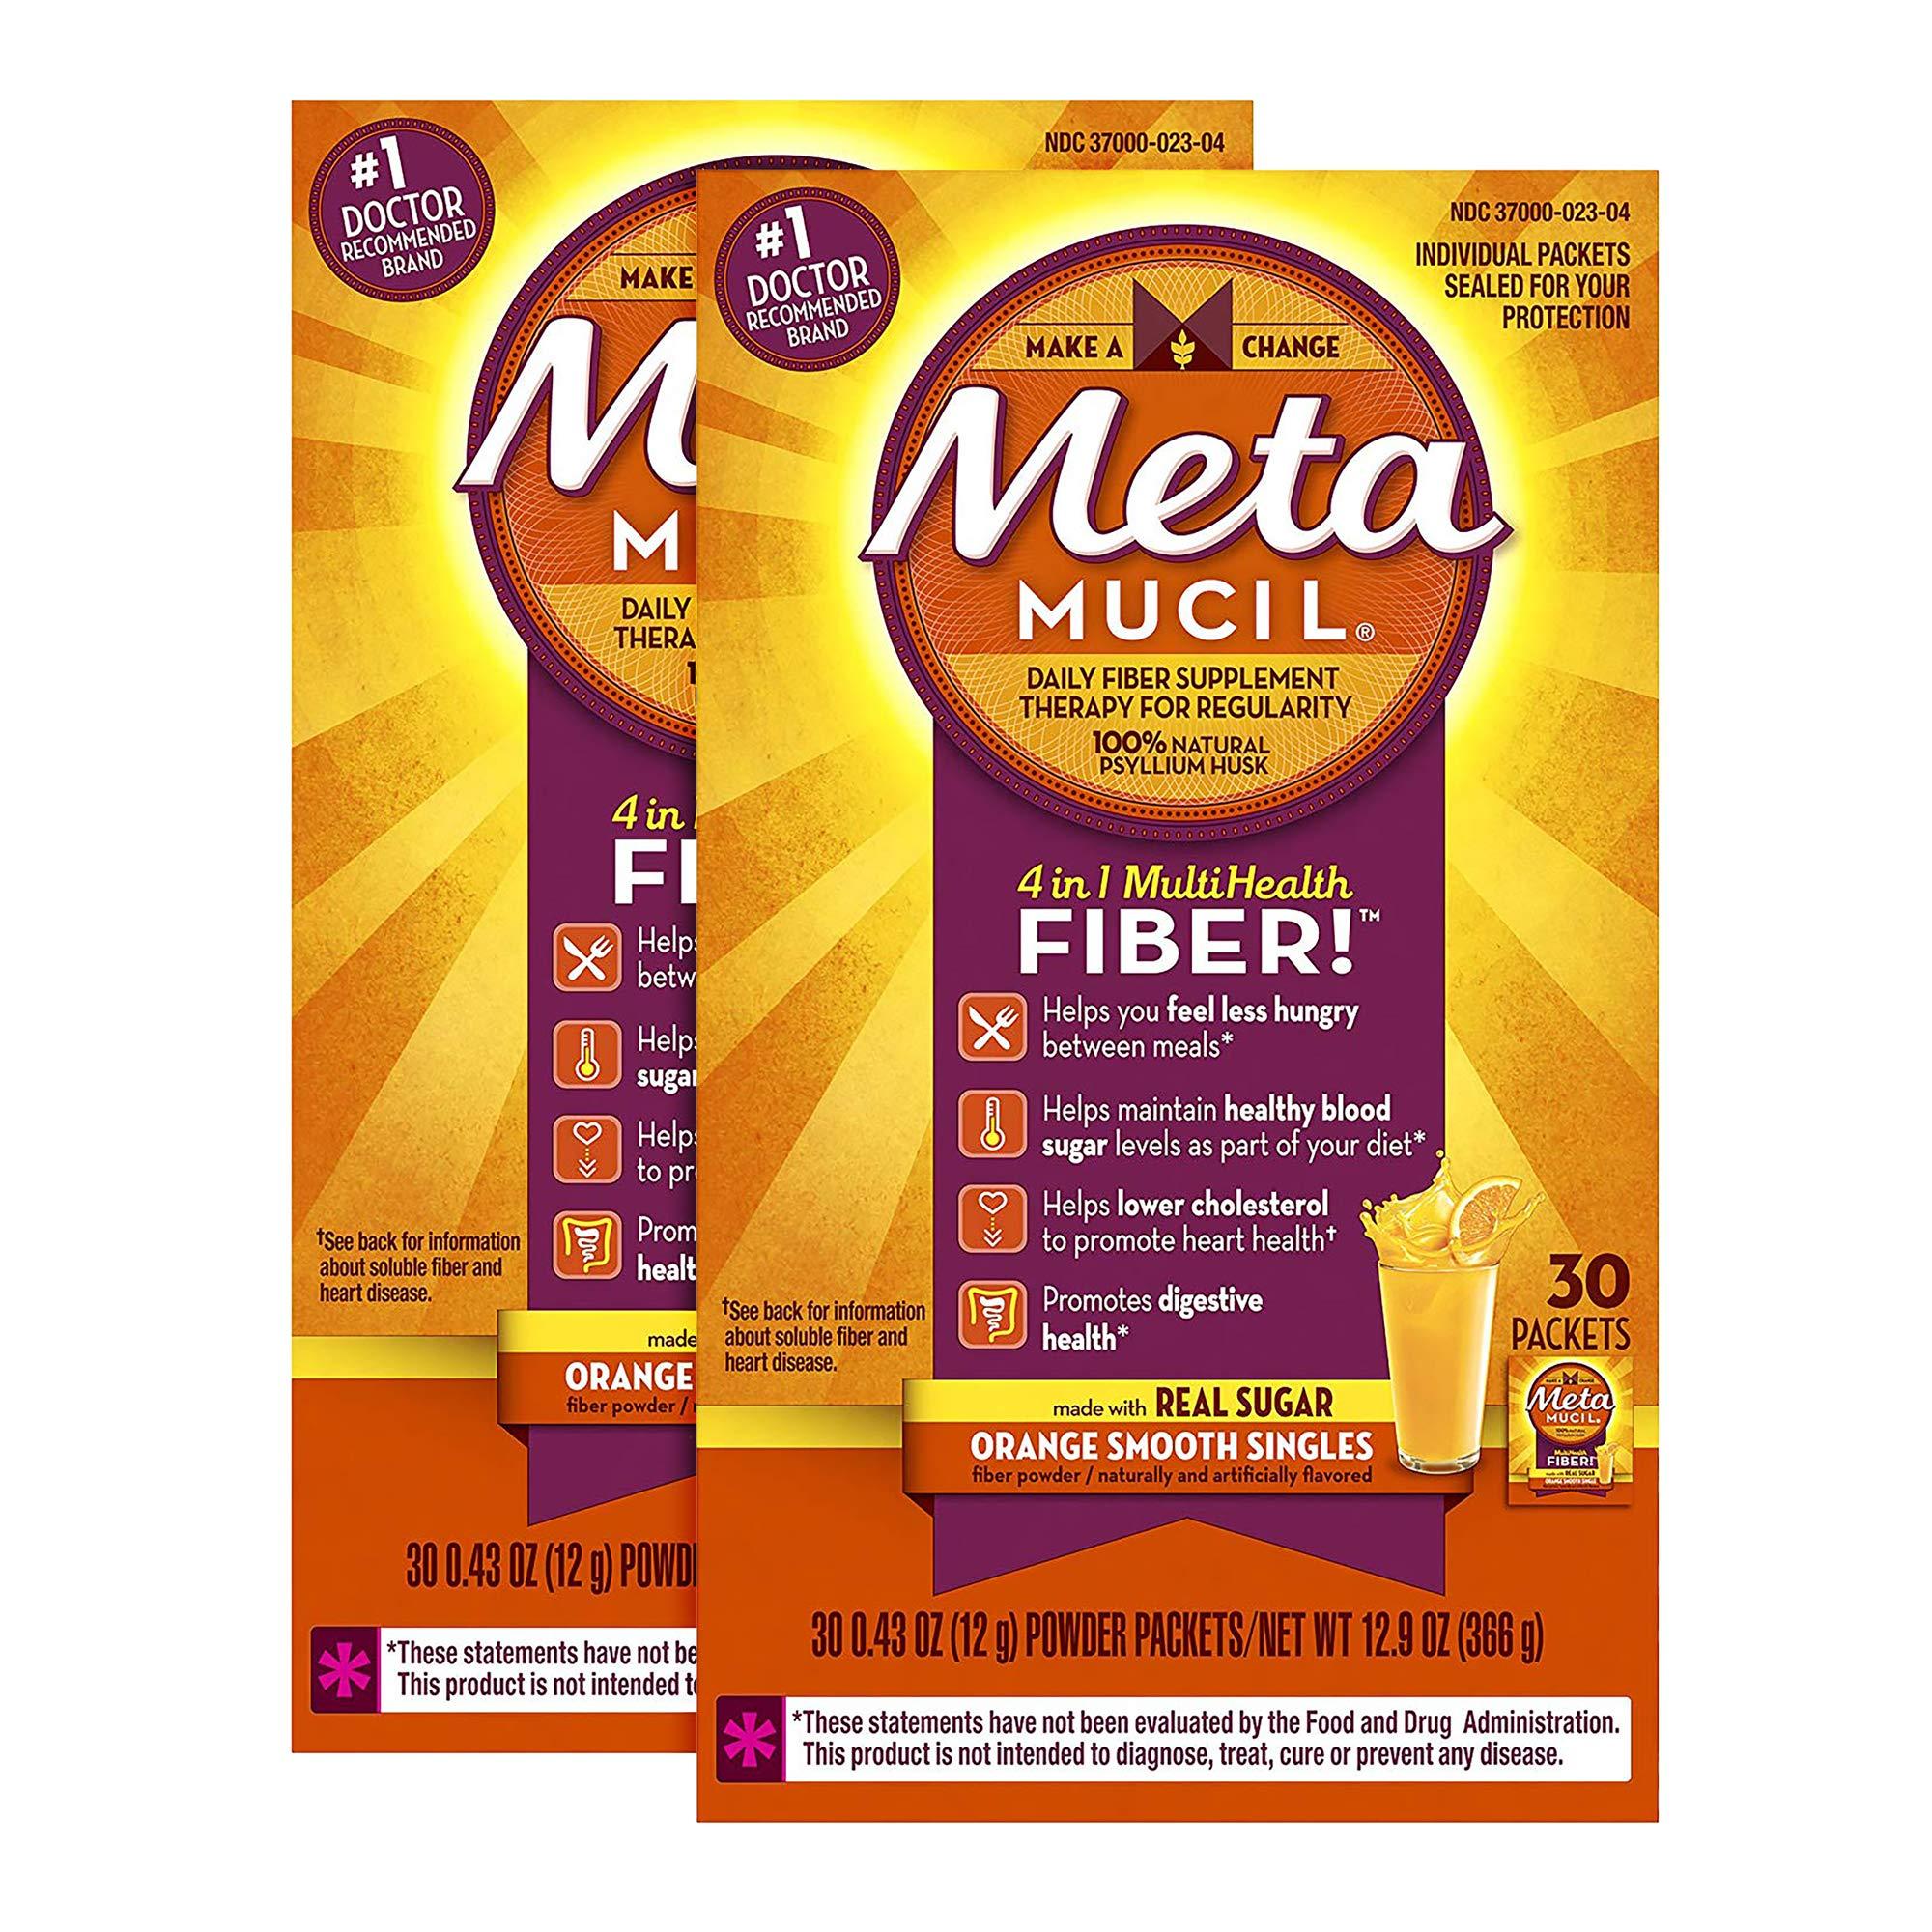 Metamucil Multi-Health Psyllium Fiber Supplement Powder with Real Sugar, Orange Flavored, 60 packets. (2x30 packets)